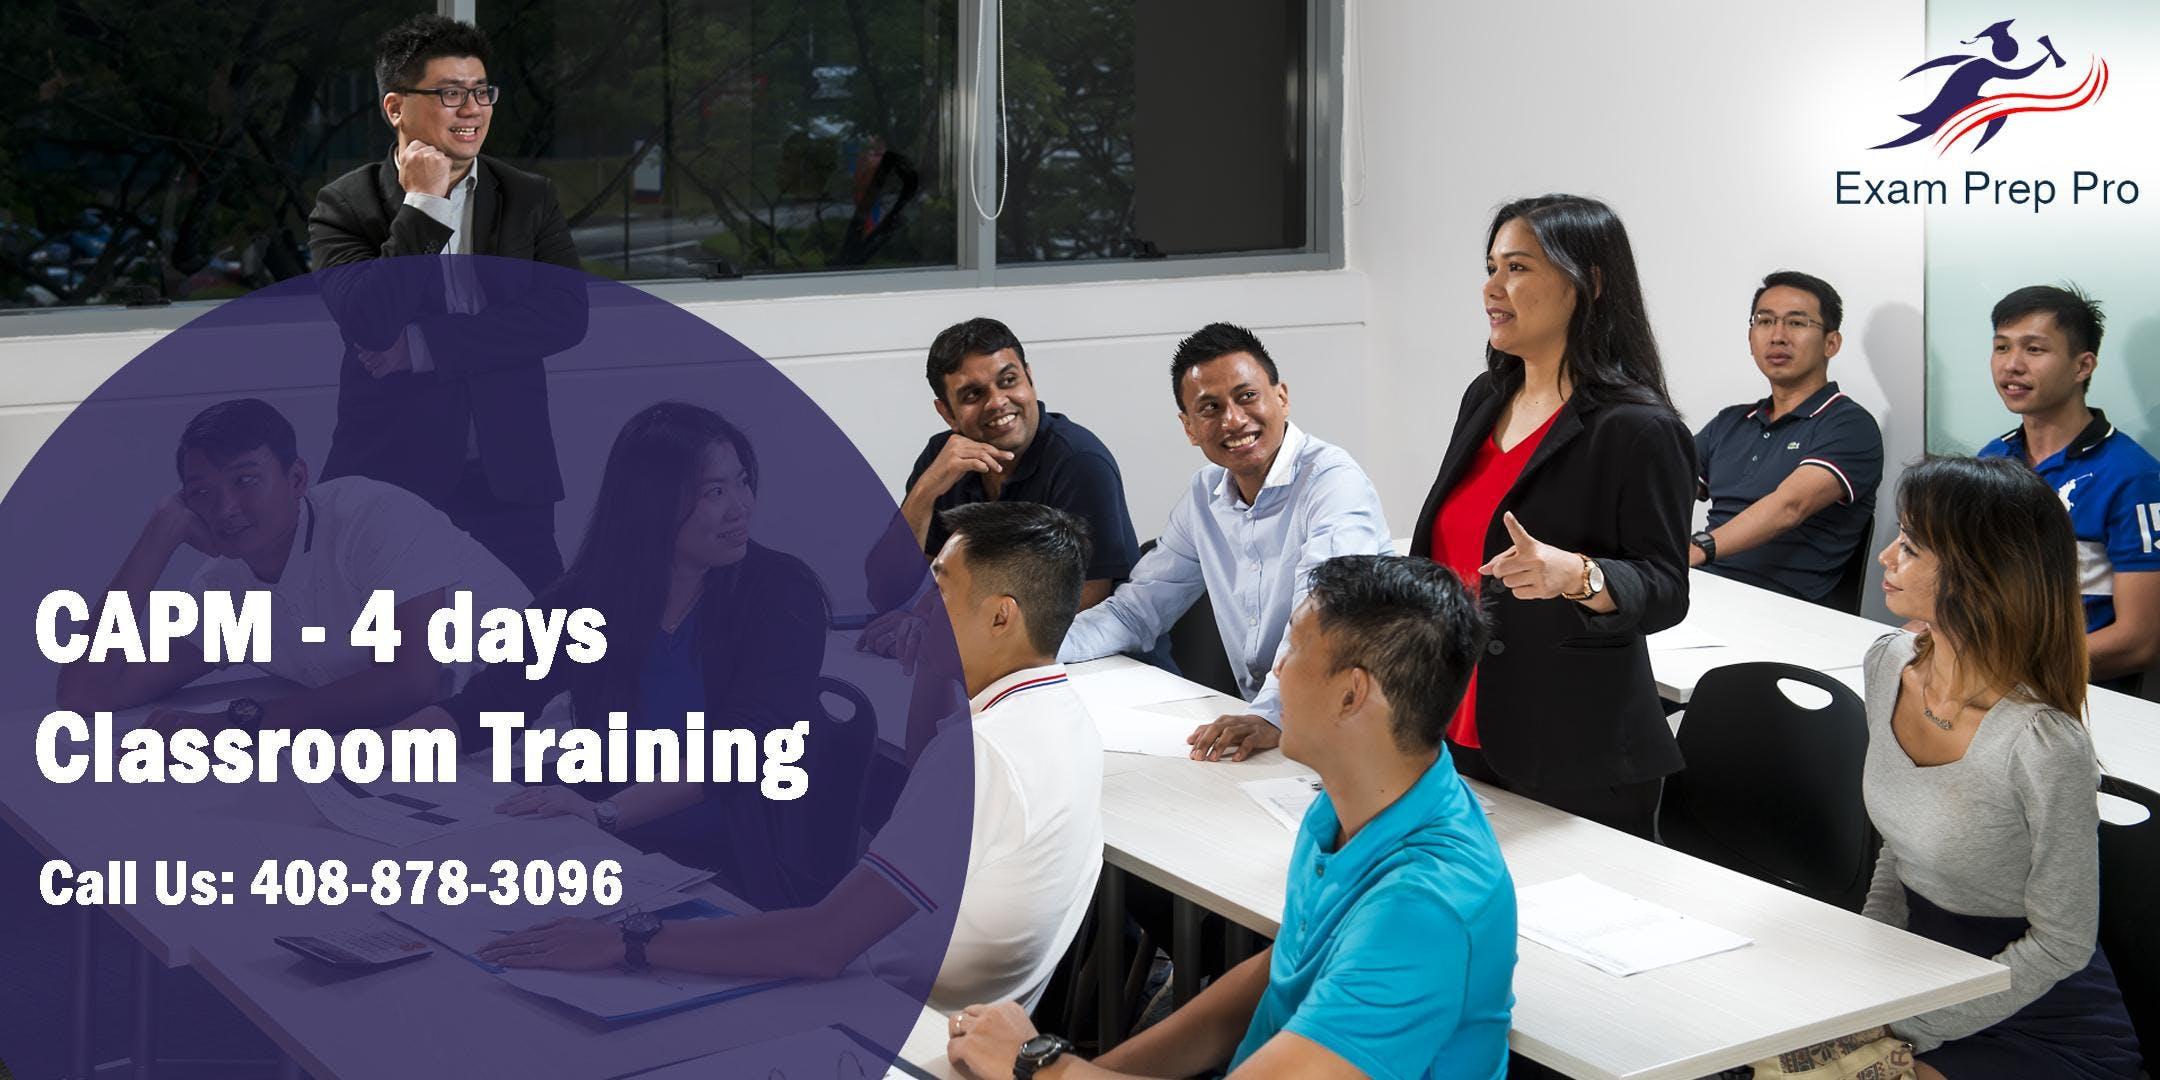 CAPM - 4 days Classroom Training  in Sacramen